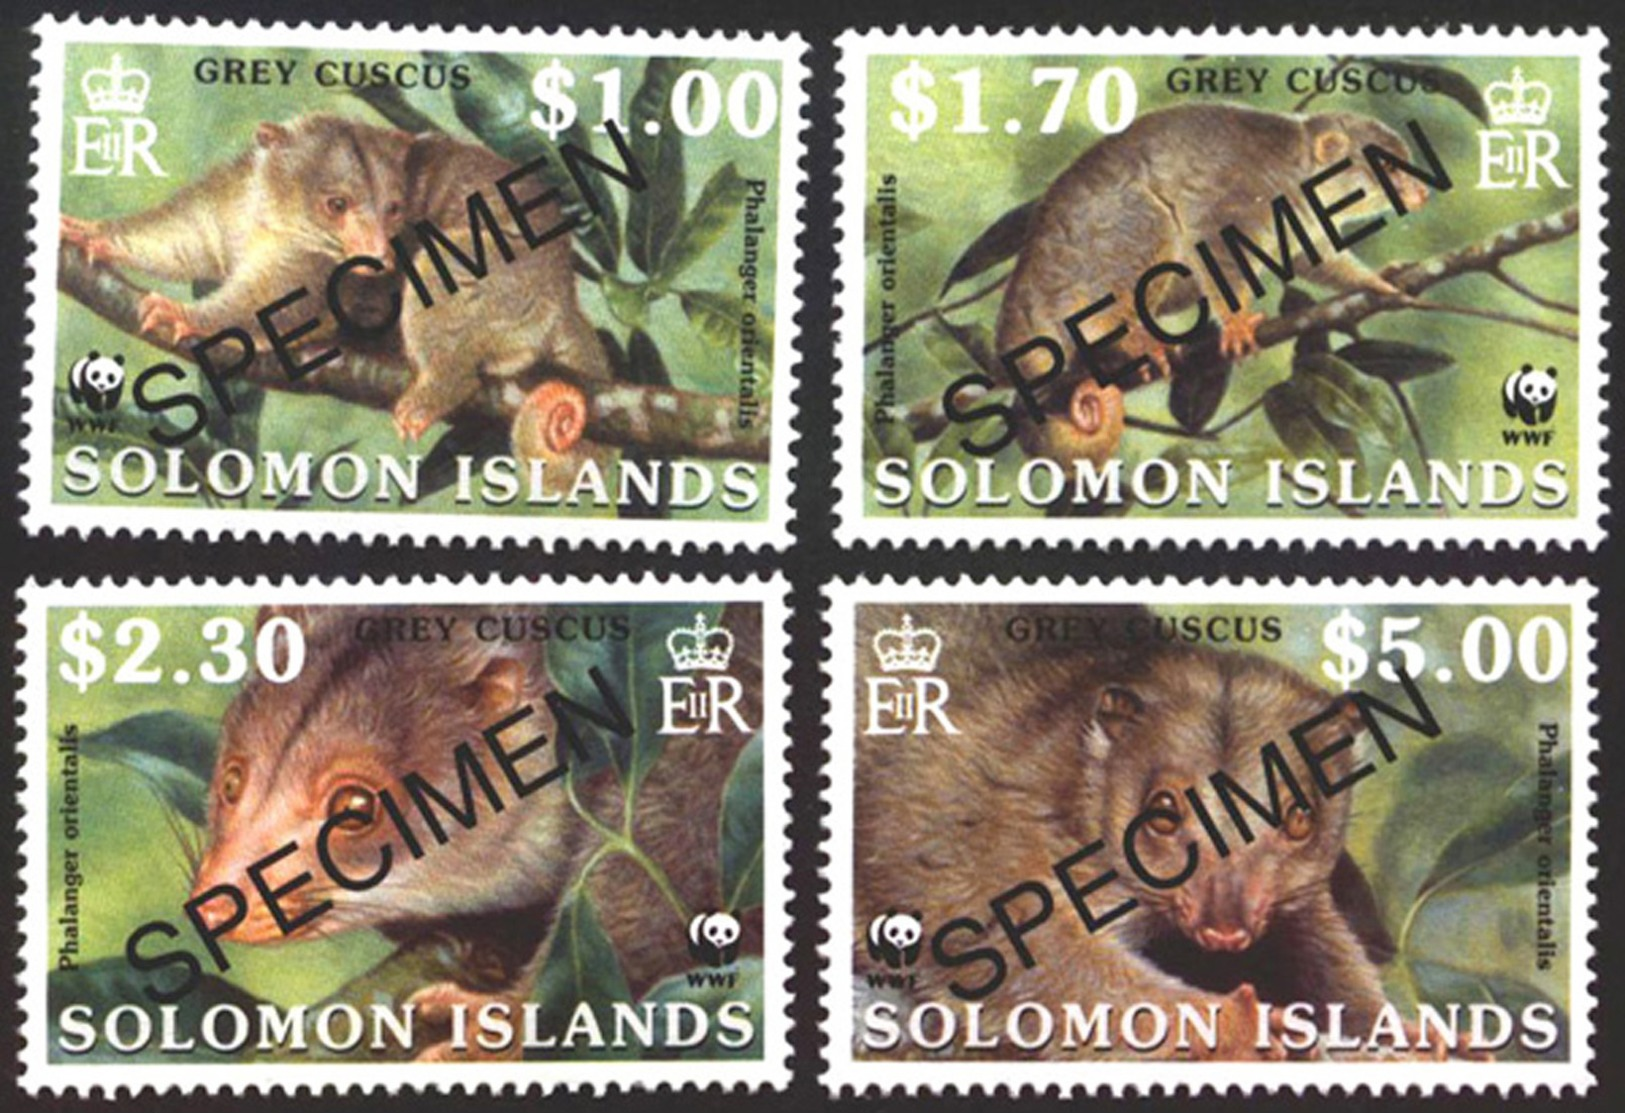 SOLOMON ISLANDS STAMPS, SET @F 4, FAUNA, WWF, SPECIMEN, MNH - Solomoneilanden (1978-...)